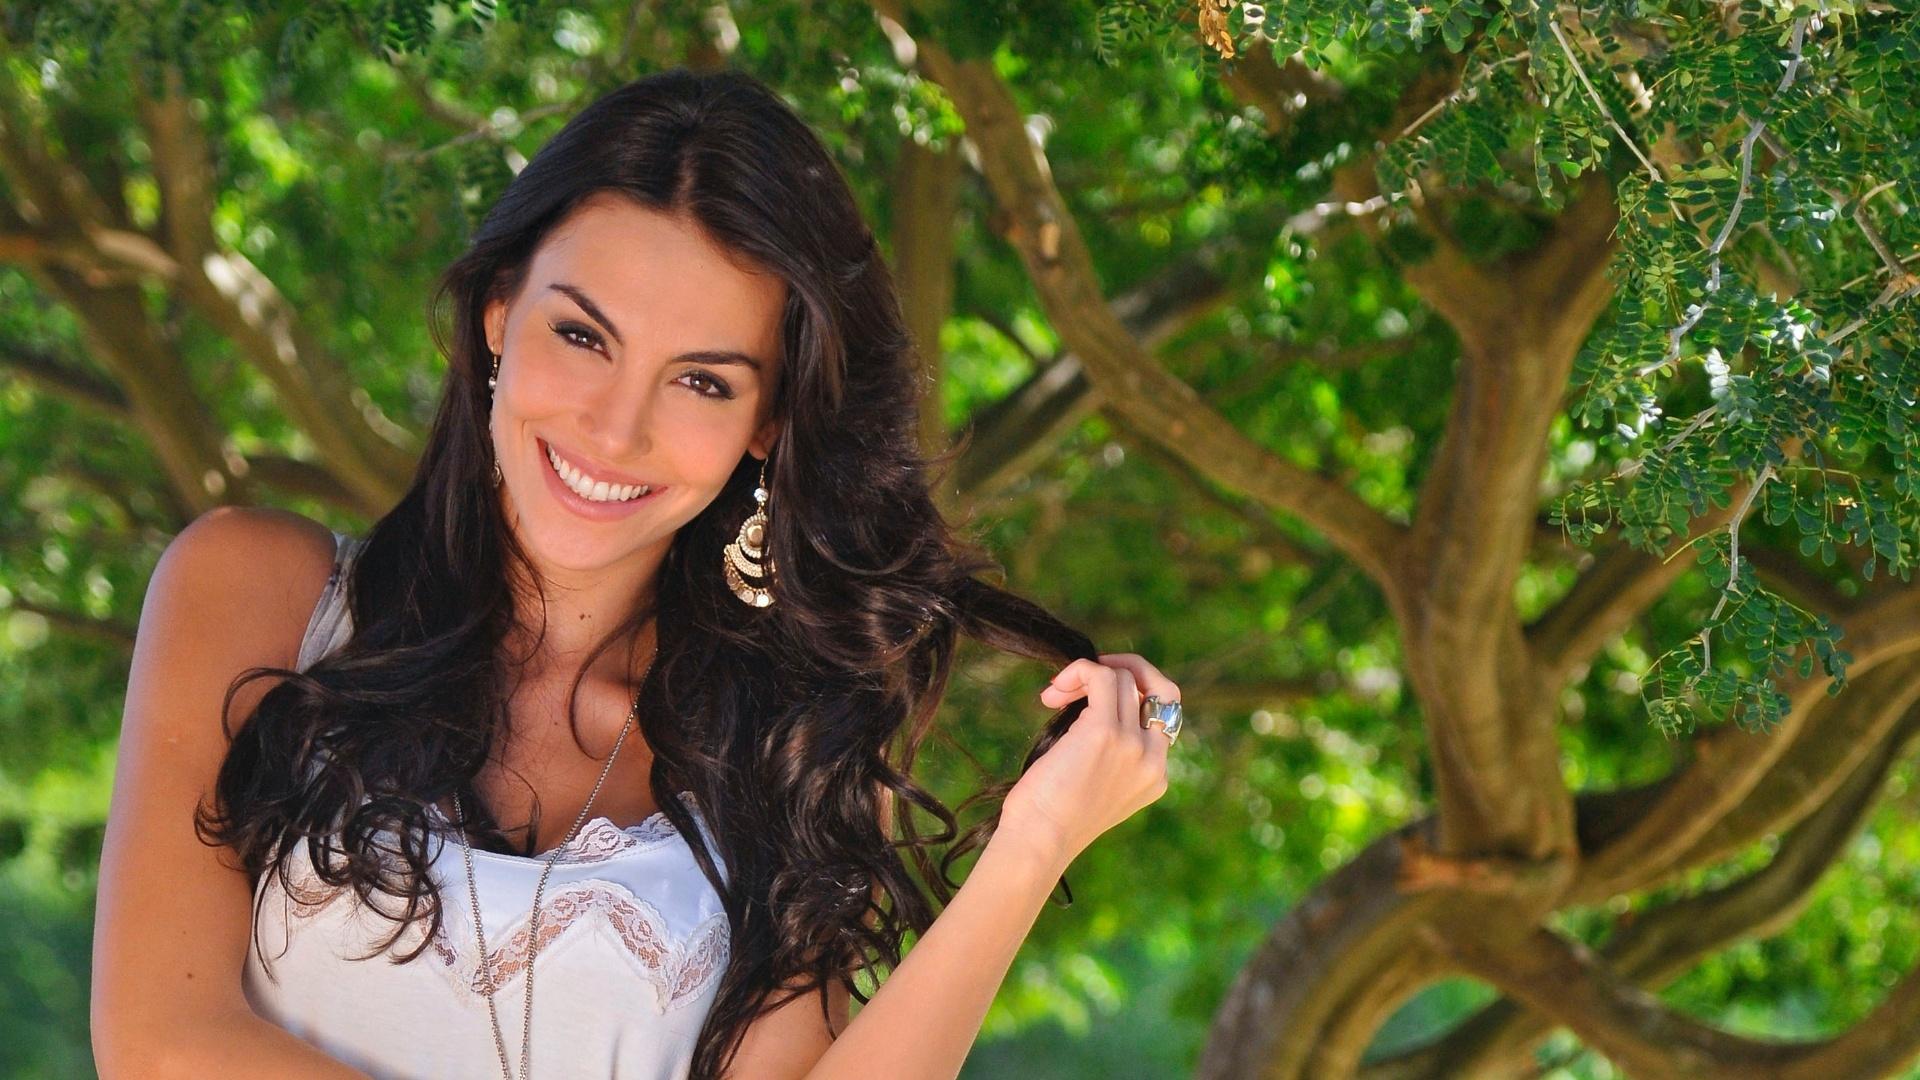 mel fronckowiak, miss bottom 2008, top 2 de miss mundo brasil 2007. - Página 2 Blc36cqx